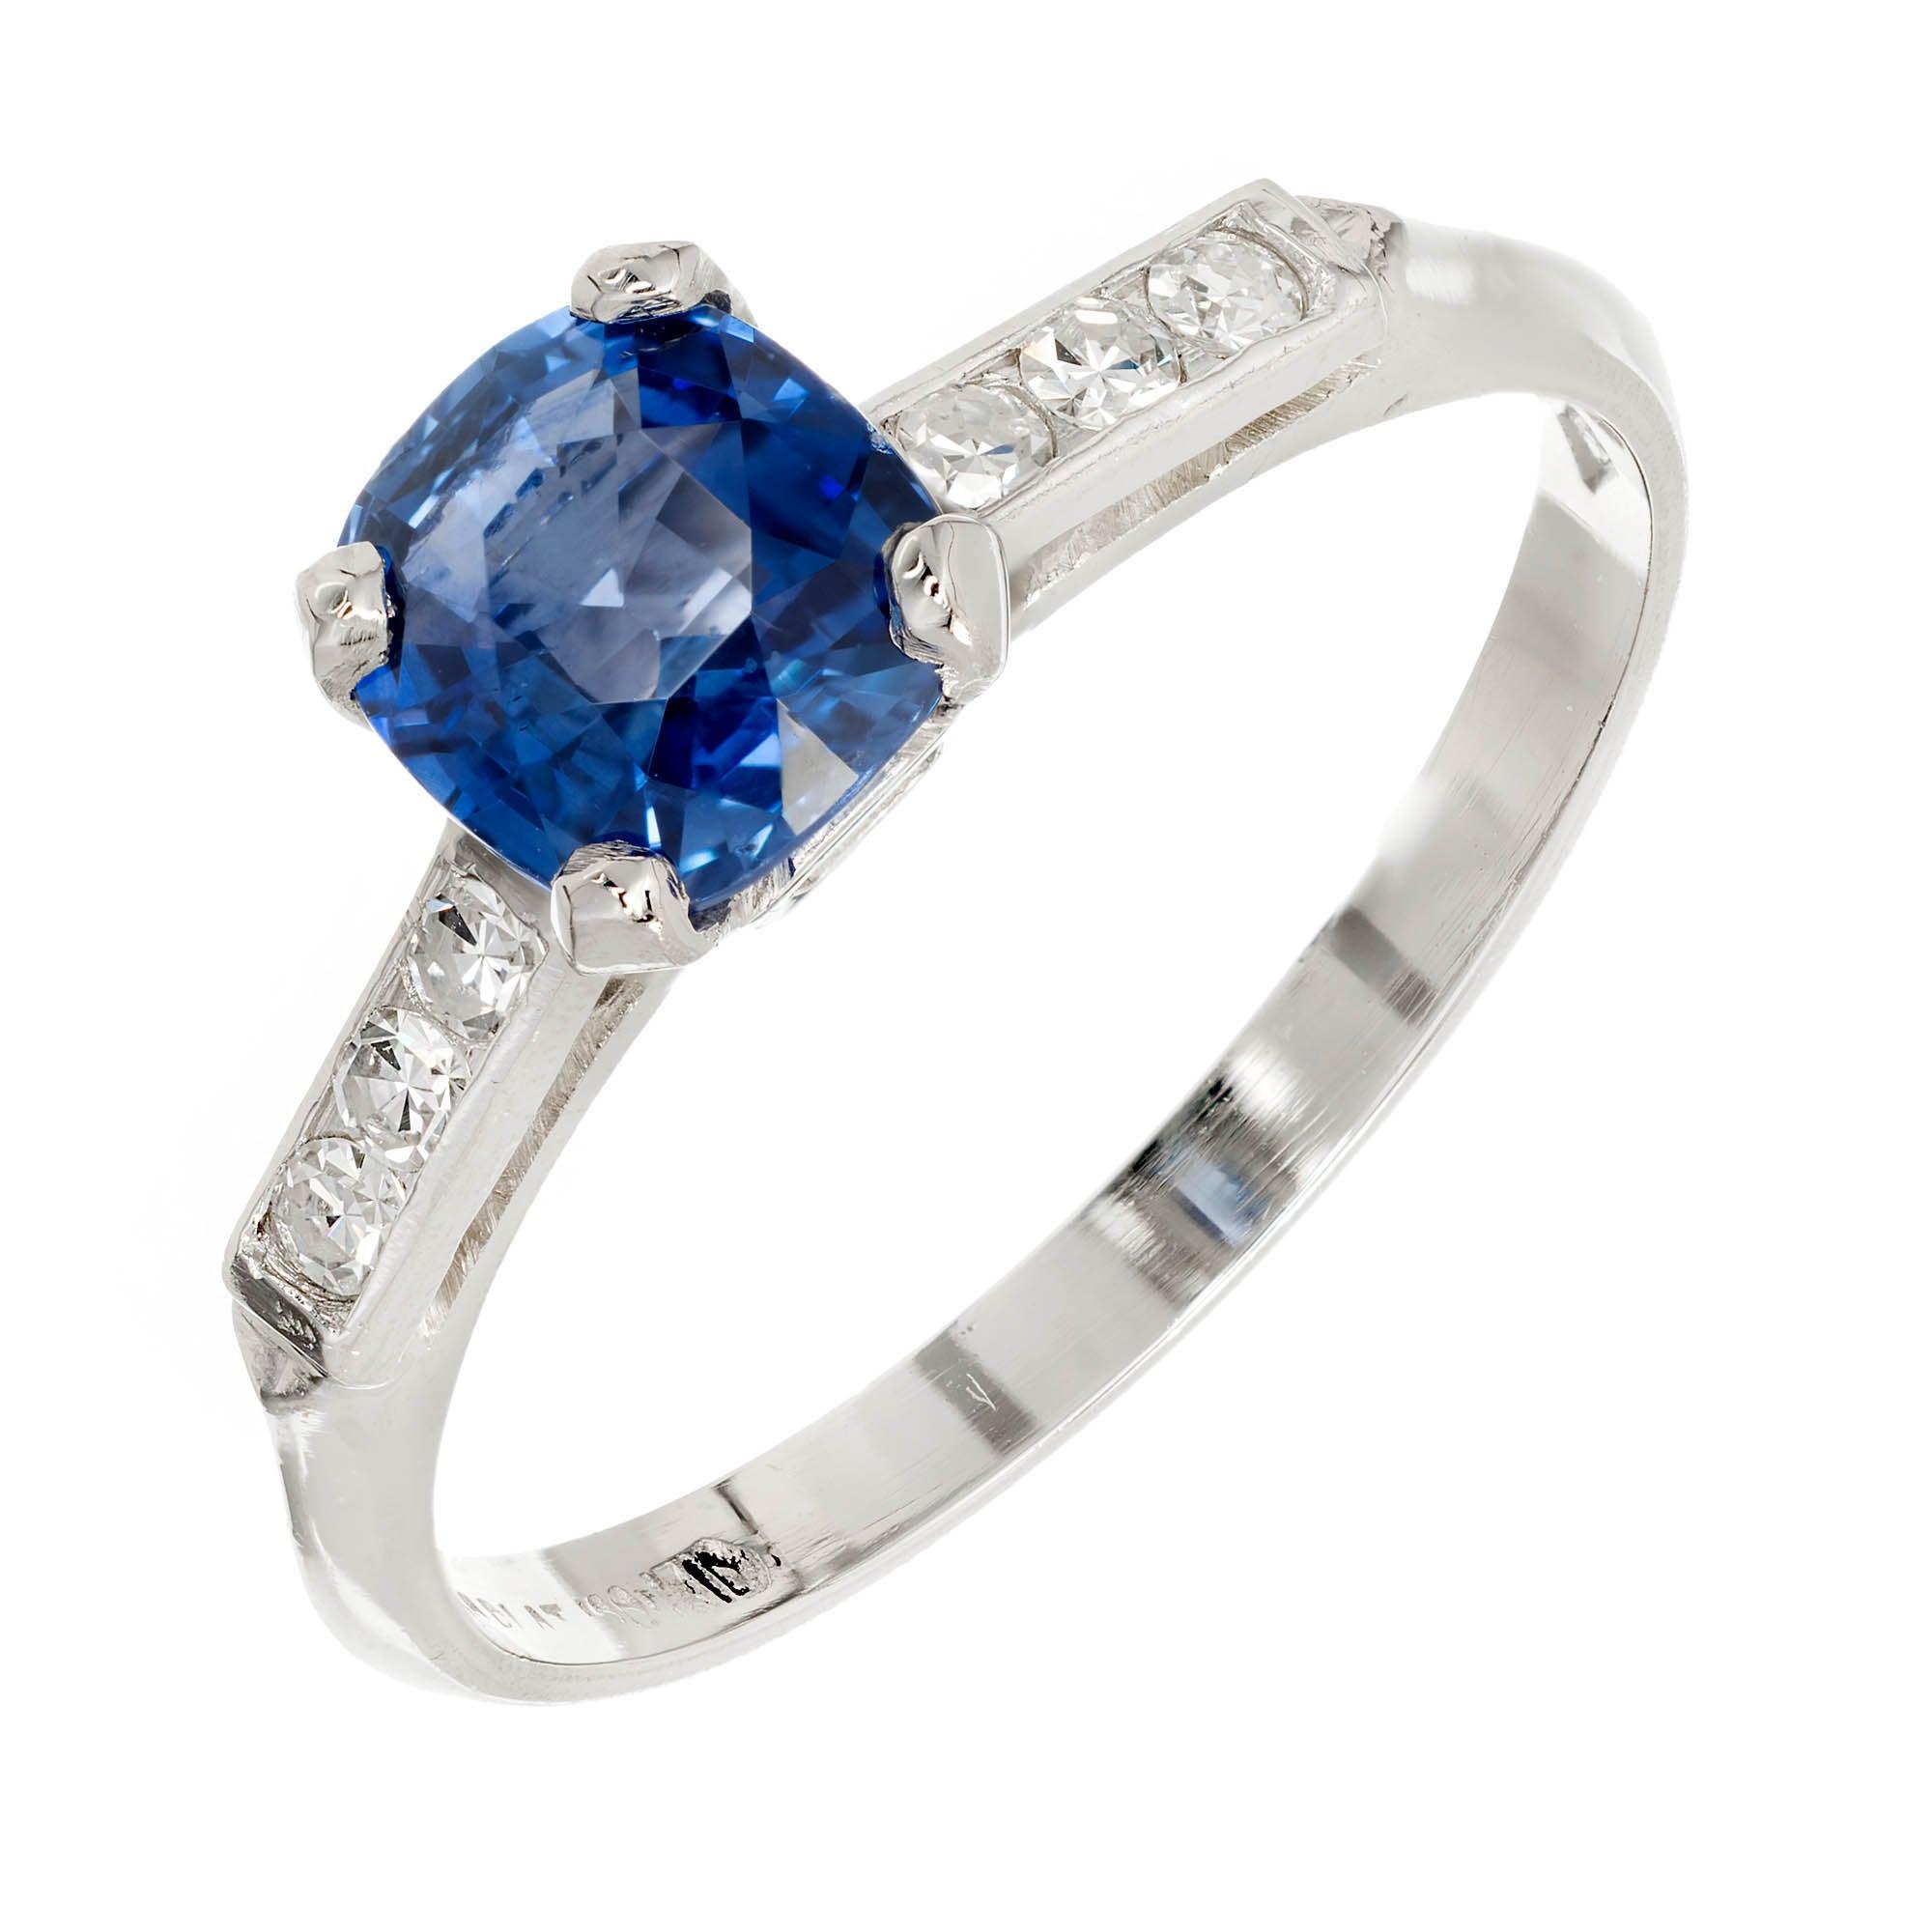 GIA Certified 1.03 Carat Blue Sapphire Diamond Platinum Engagement Ring